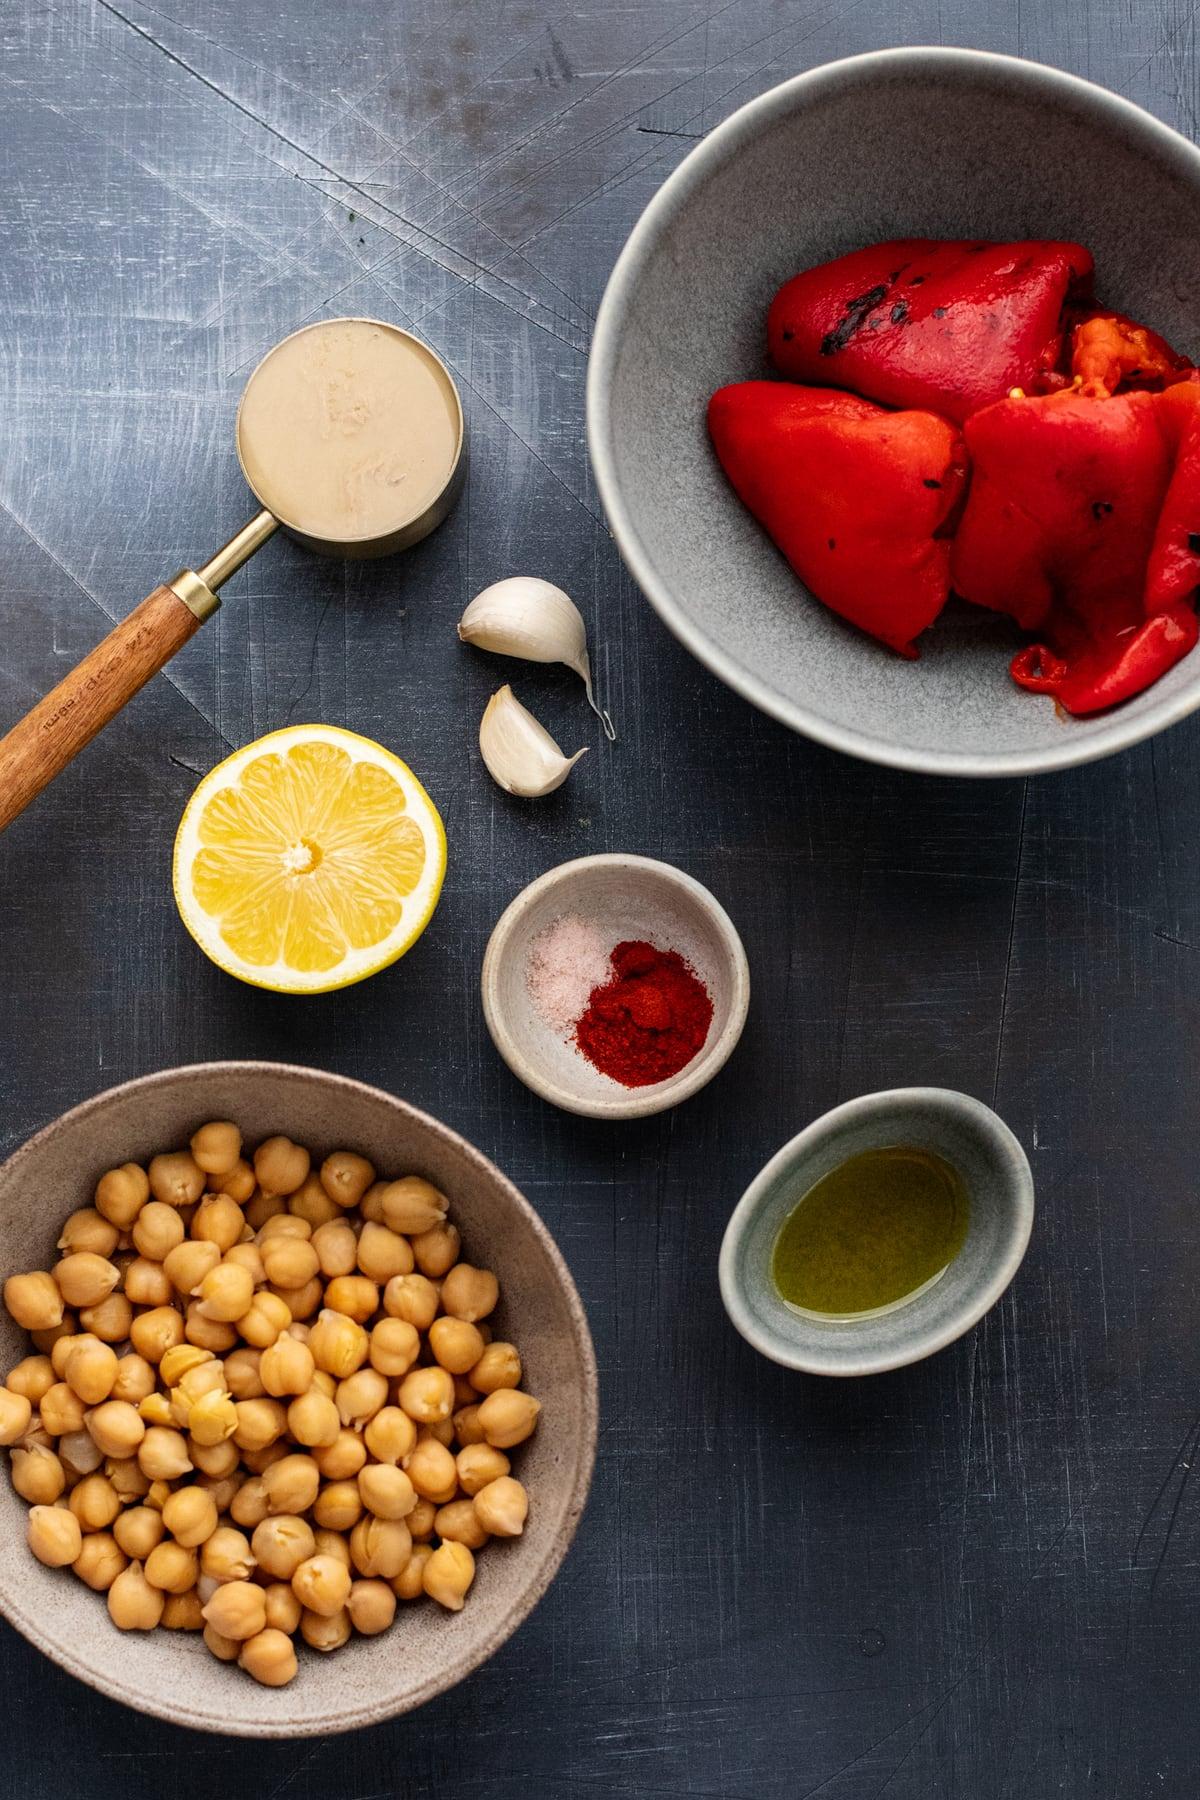 ingredients for red pepper hummus arranged on dark gray background.